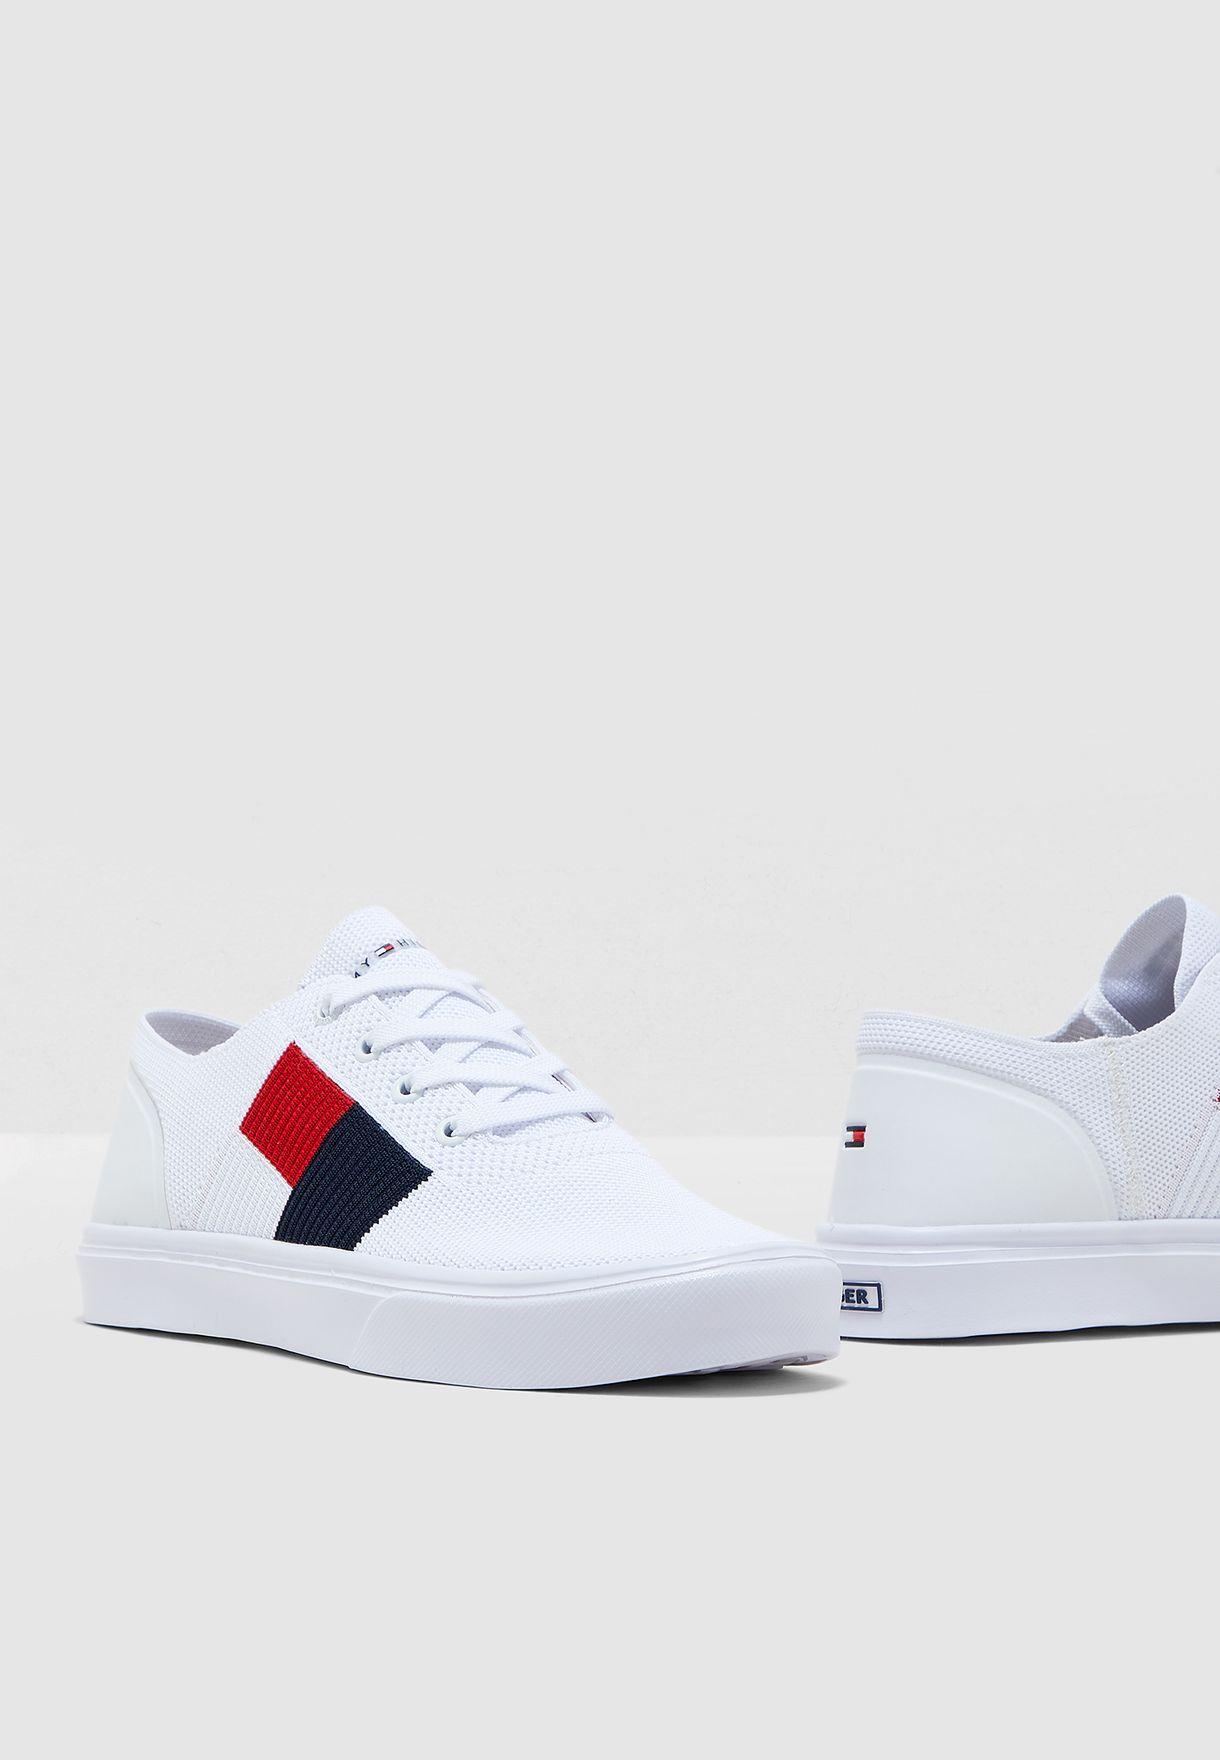 Lightweight Knit Flag Sneakers for Men